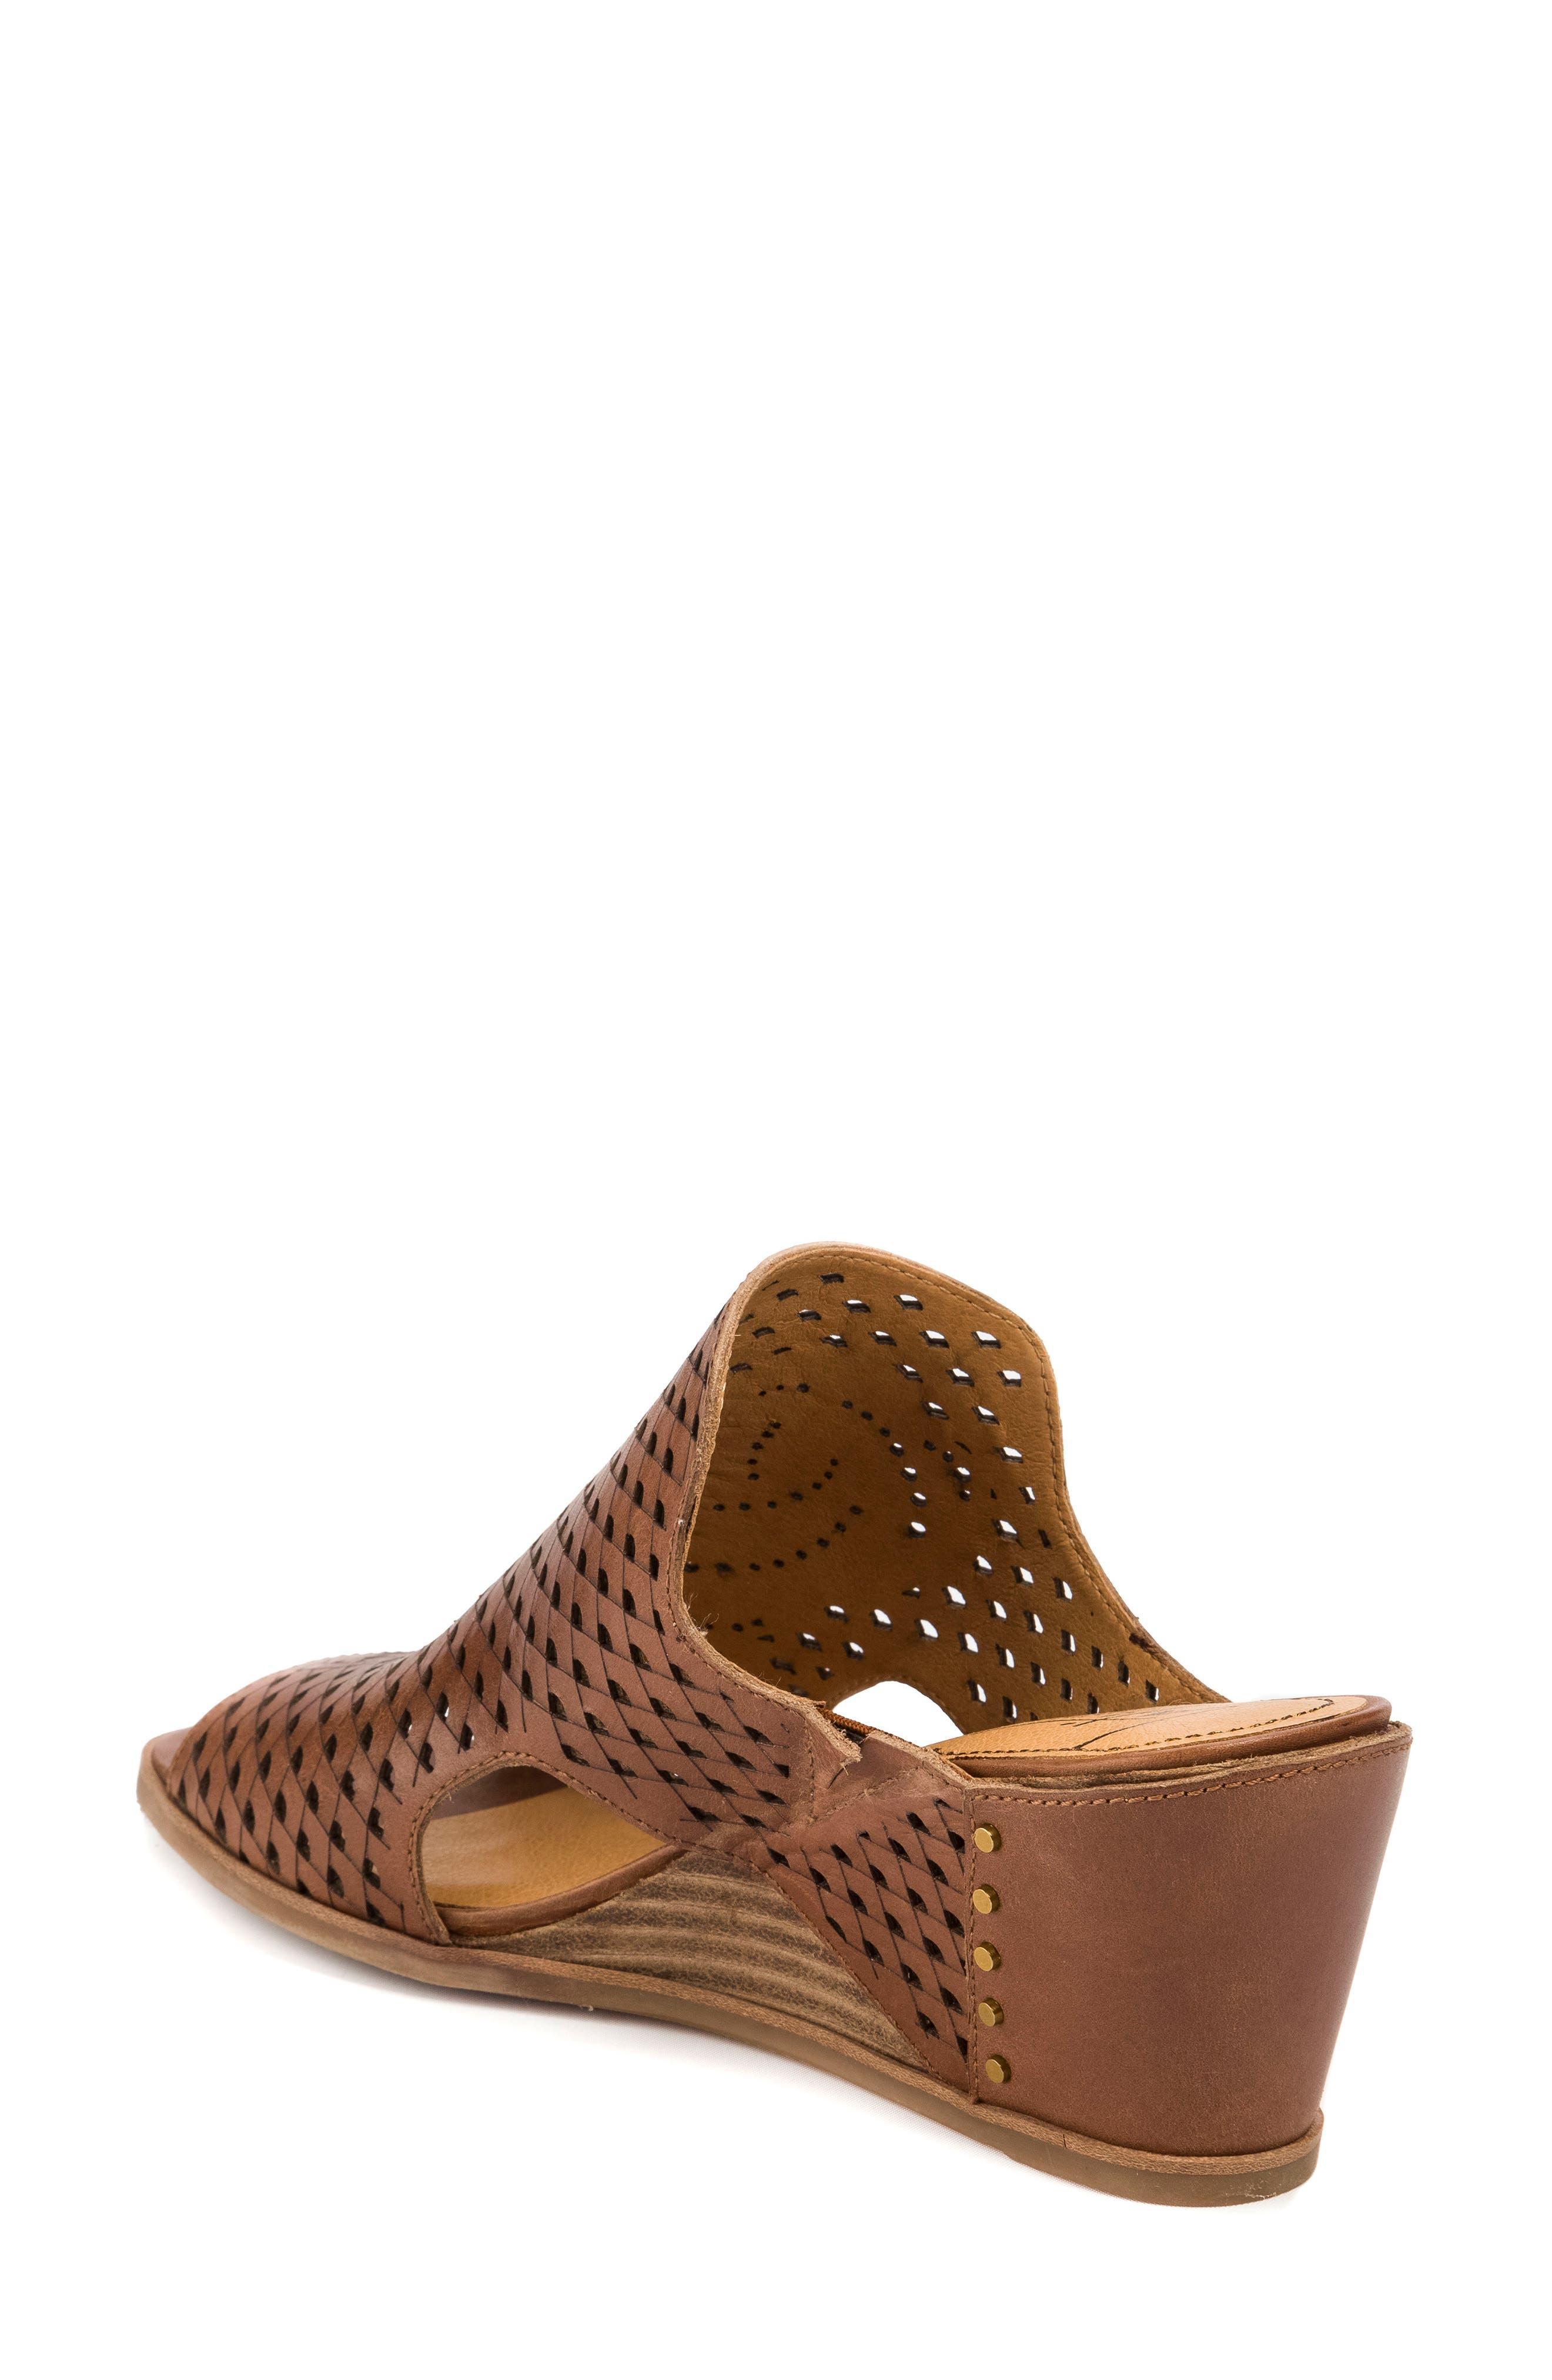 Janis Laser Cut Wedge Sandal,                             Alternate thumbnail 2, color,                             Brush Brown Leather